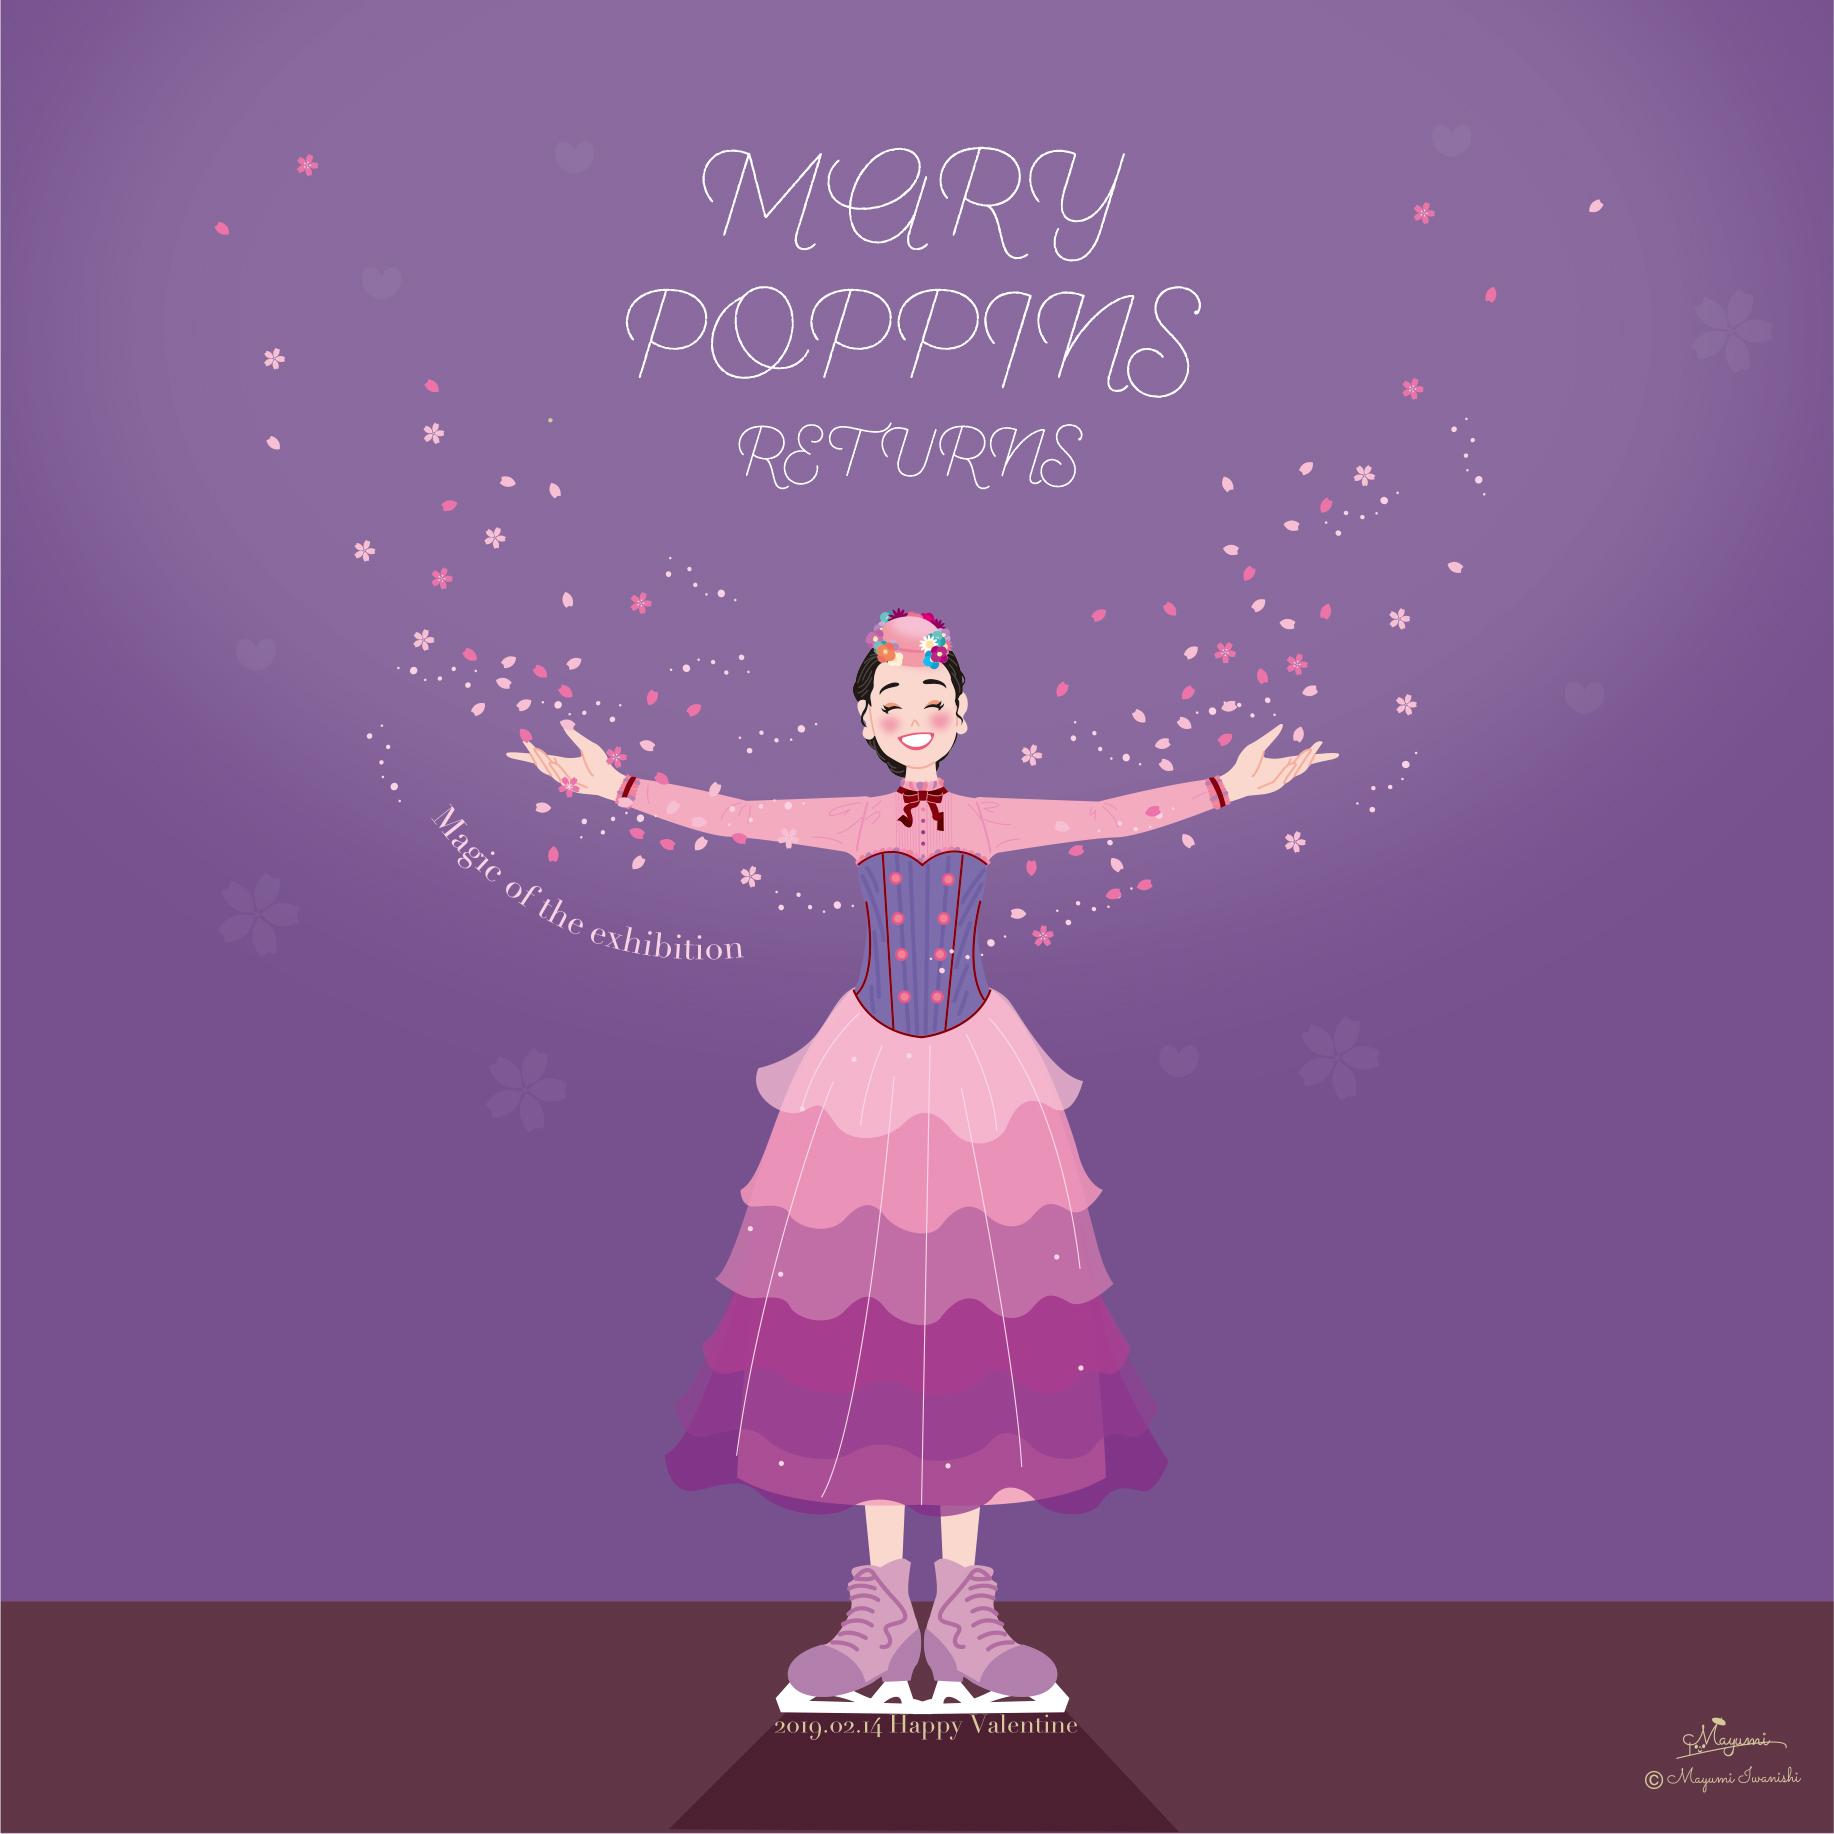 MARY POPPINS RETURNS~魔法のエキシビション~